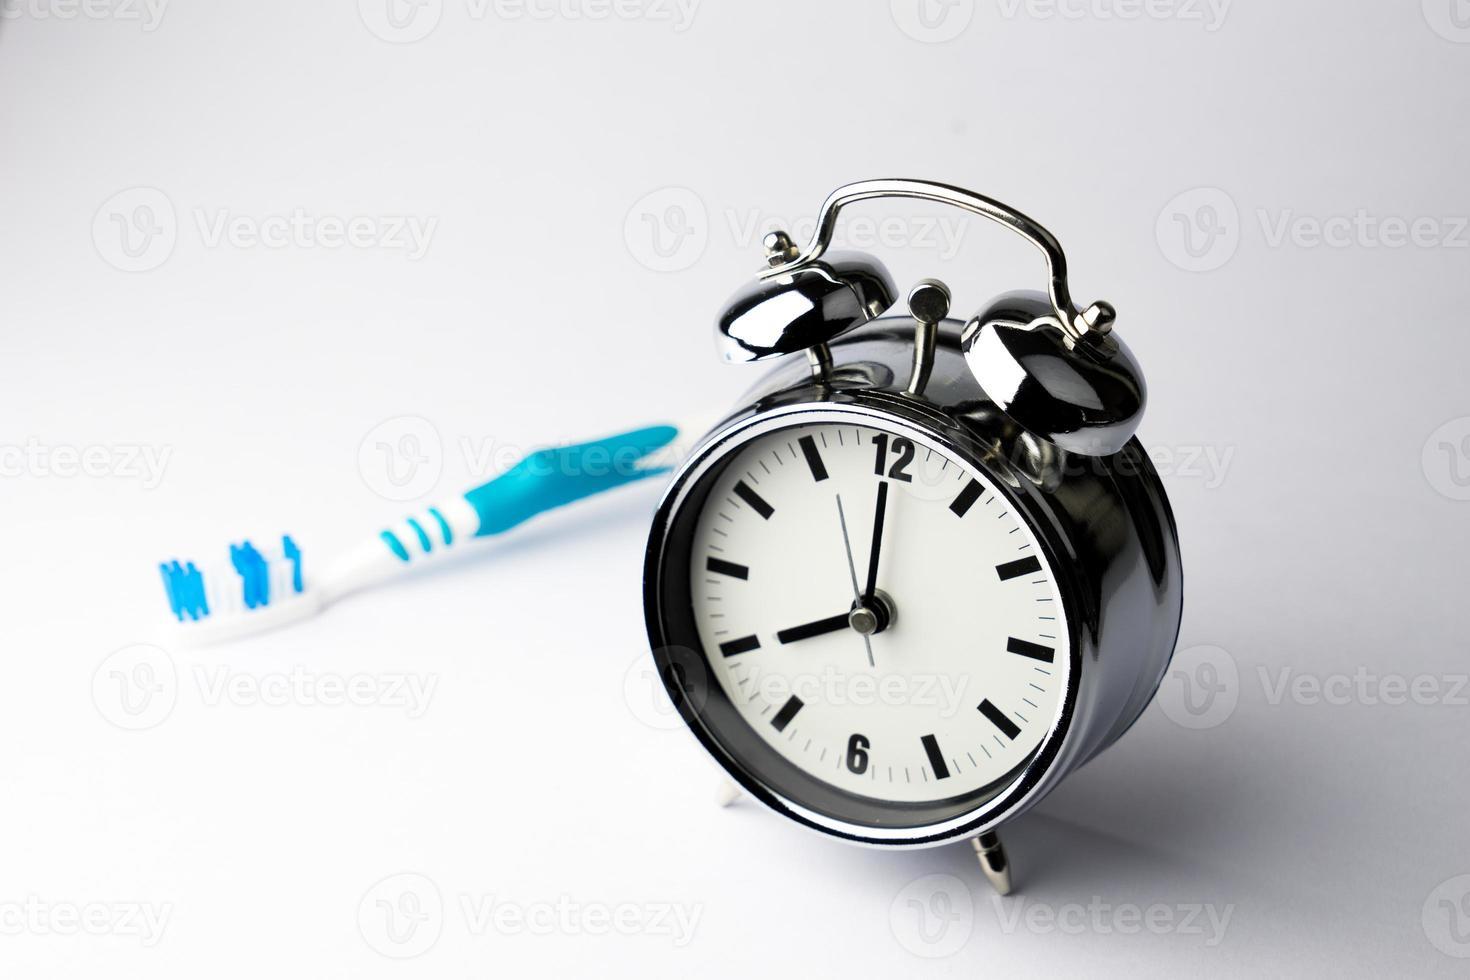 Despertador de metal, hora de despertarse, sobre fondo blanco. foto